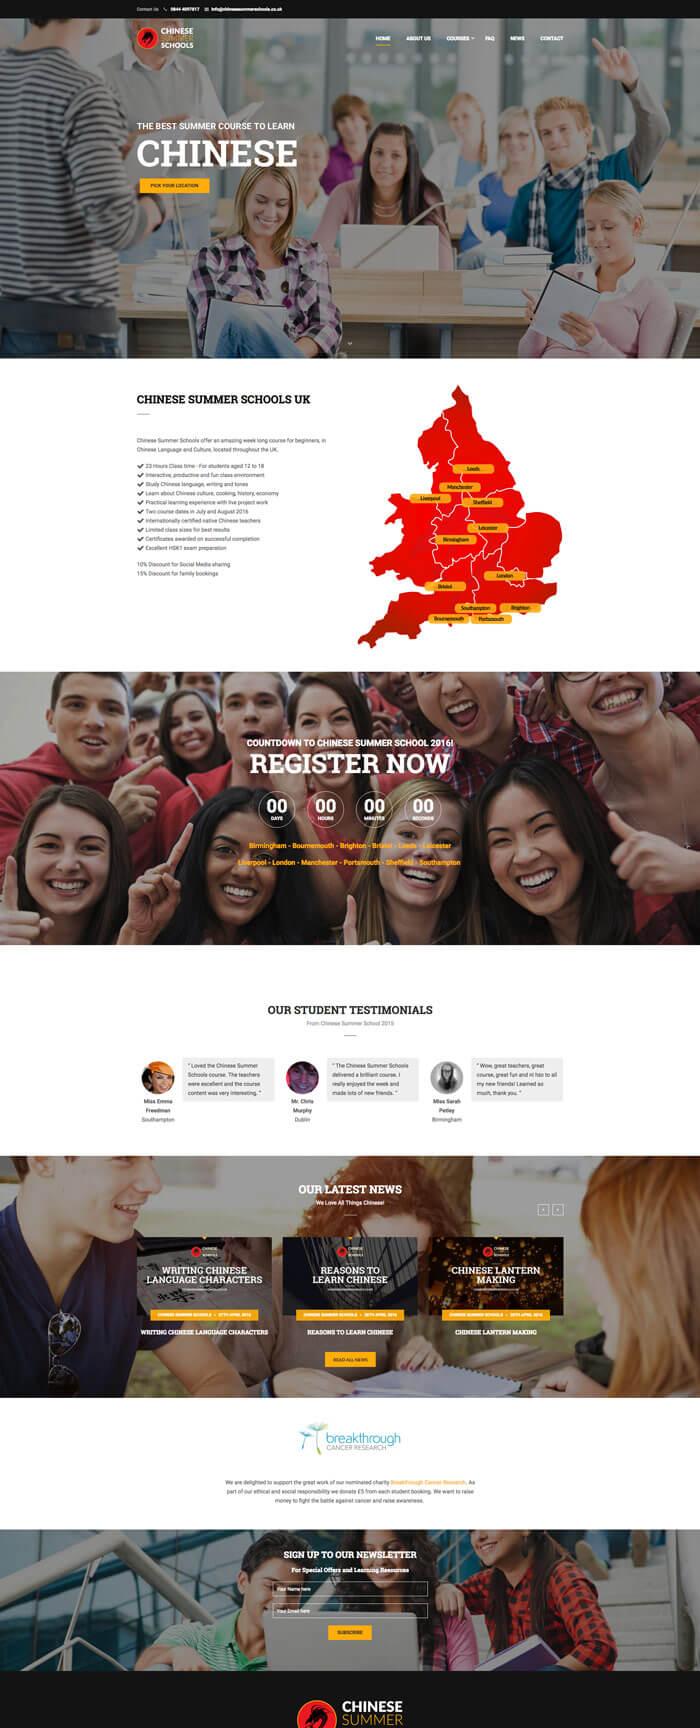 web site online learning.jpg